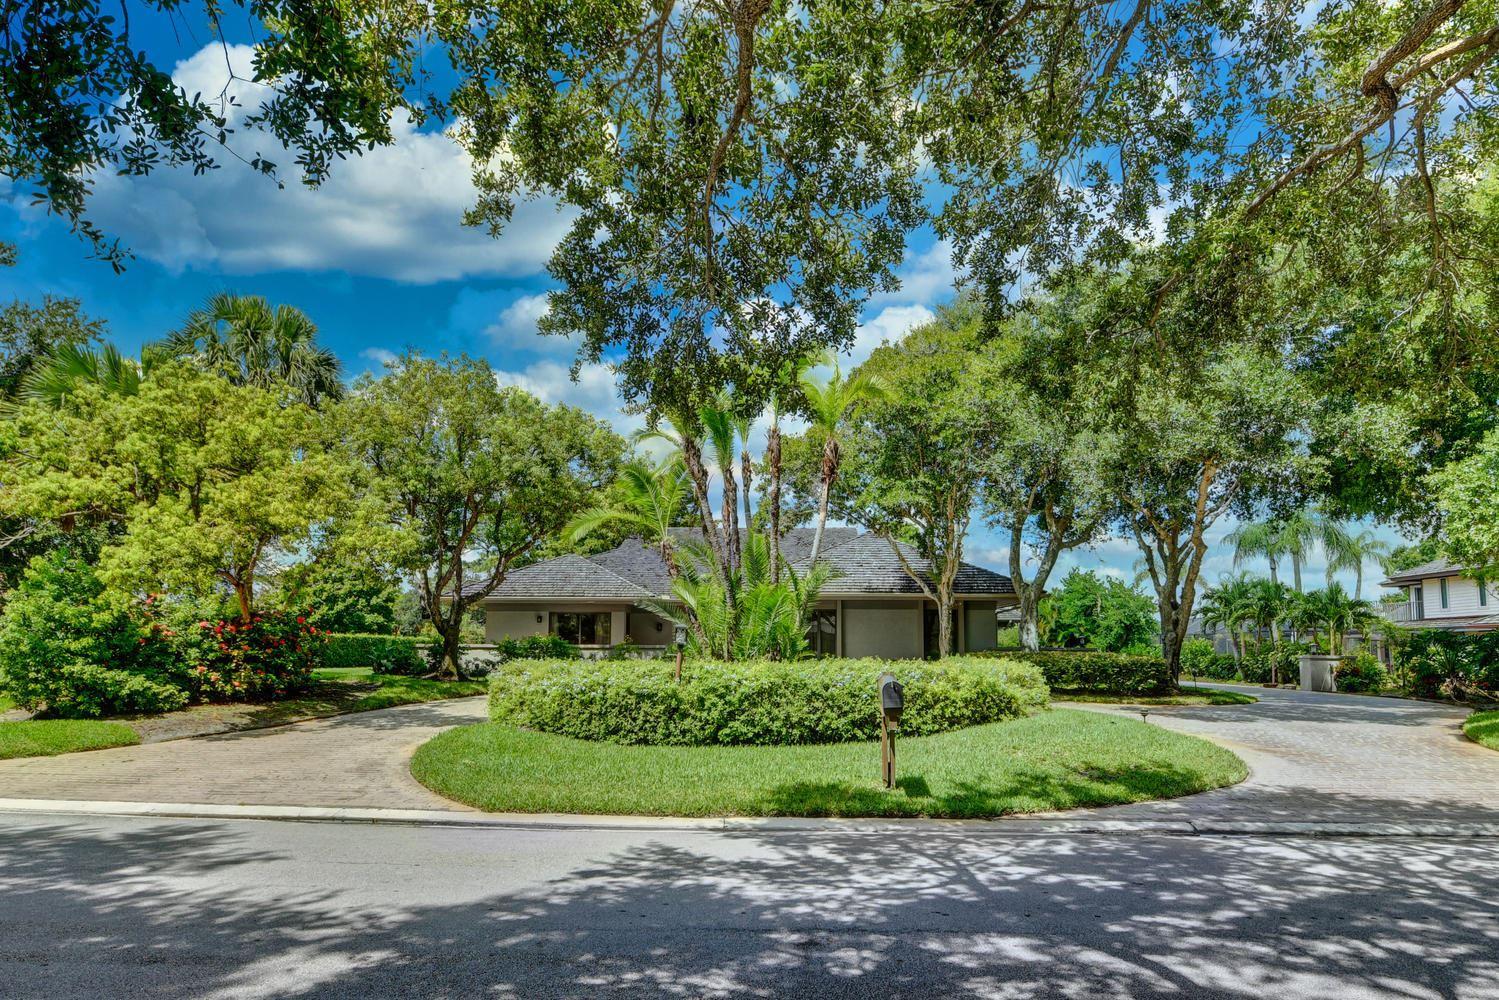 Photo of 6040 SE Mariner Sands Drive, Stuart, FL 34997 (MLS # RX-10645291)